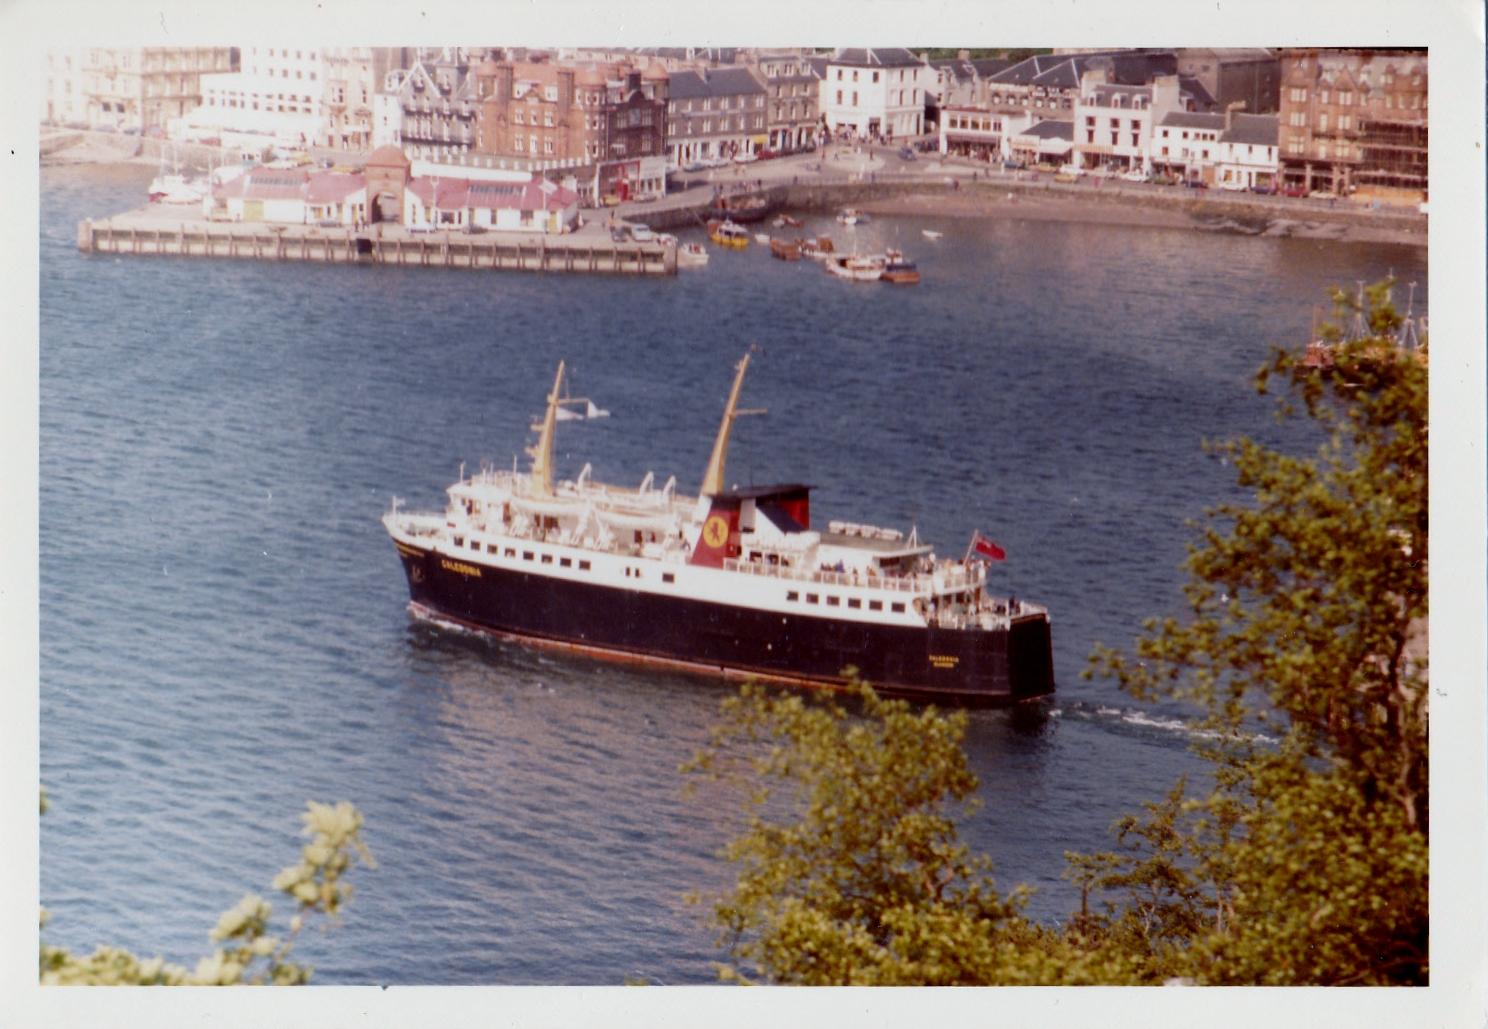 Caledonia leaving Oban (Jim Aikman Smith)